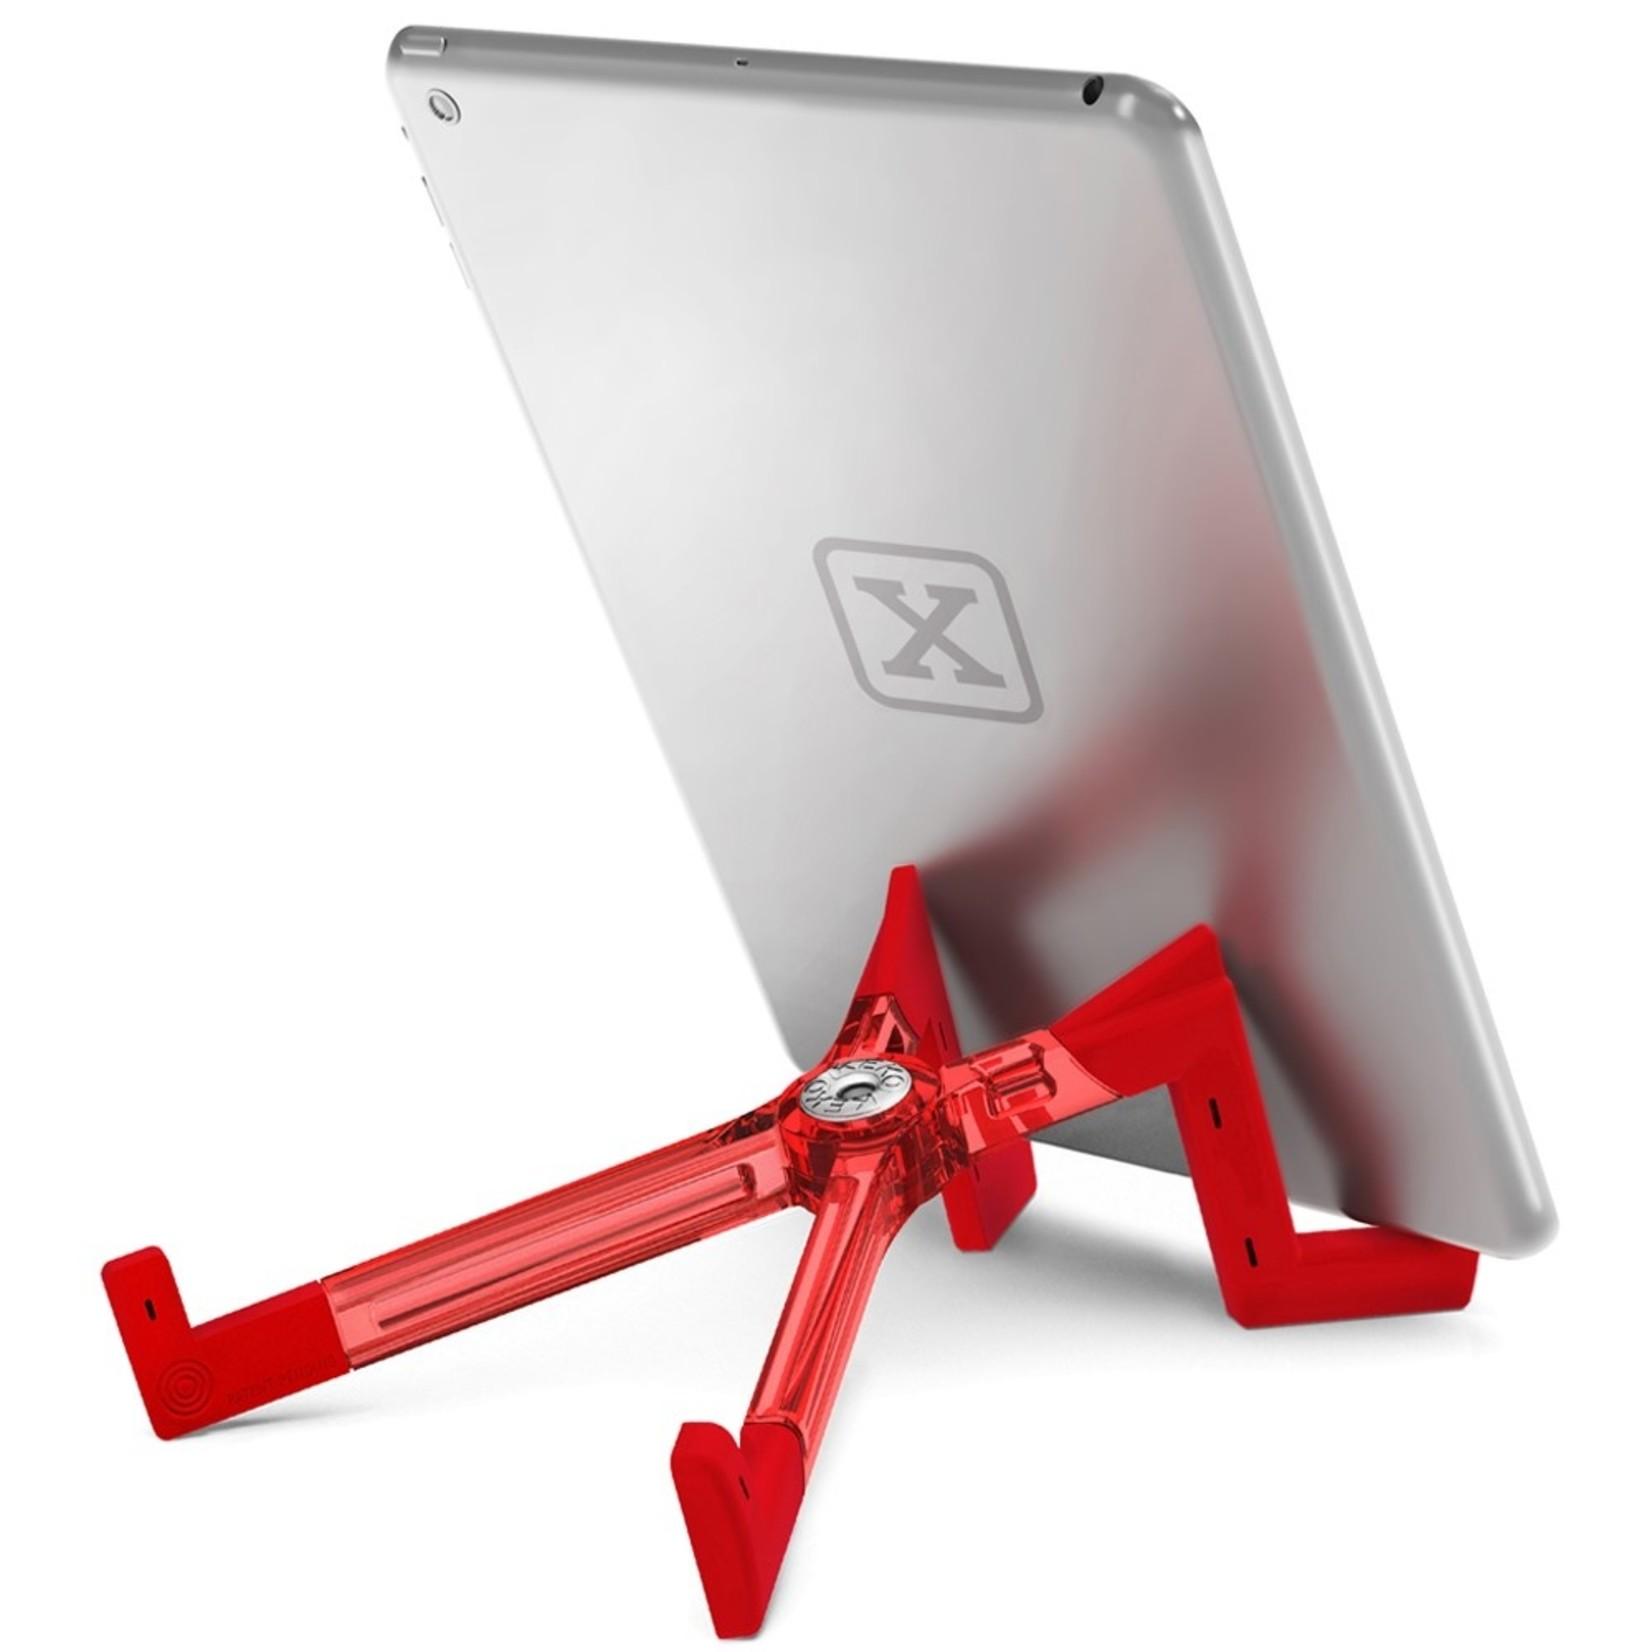 Keko Tablet Stand